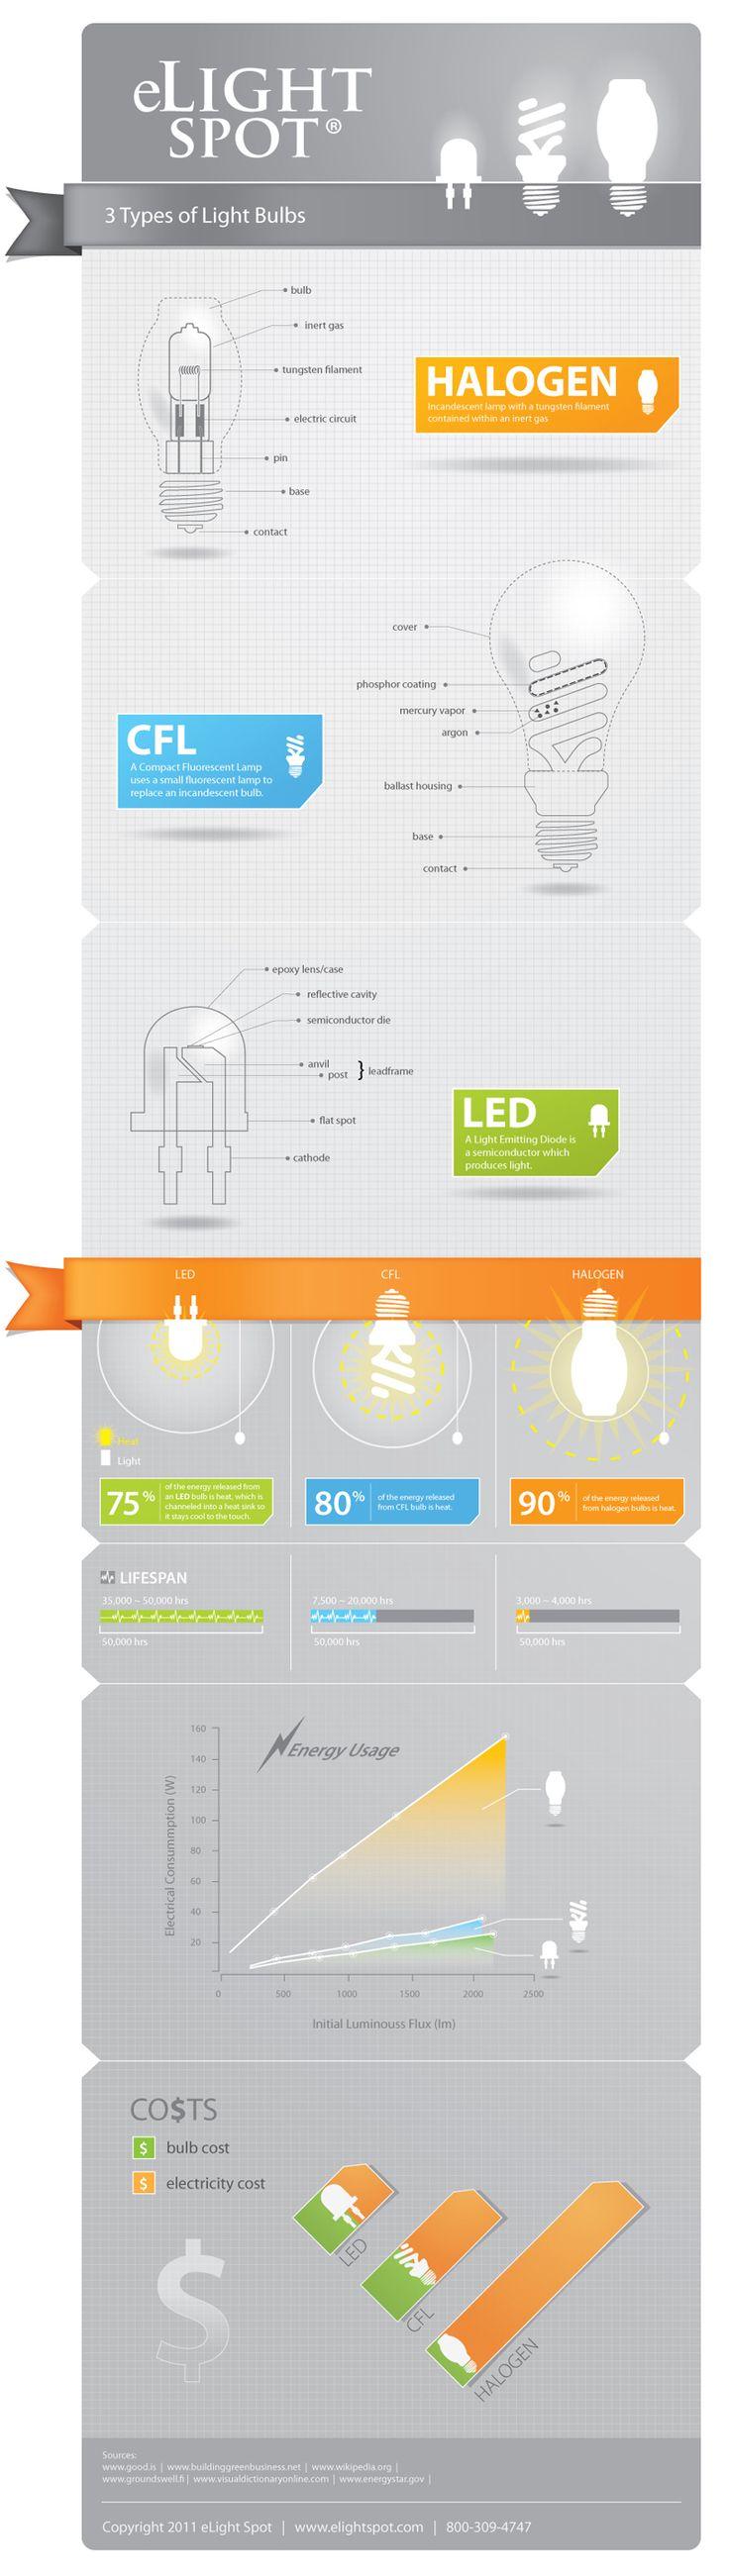 small resolution of hal genos vs bajo consumo vs led infografia medioambiente lamp design lighting designwall